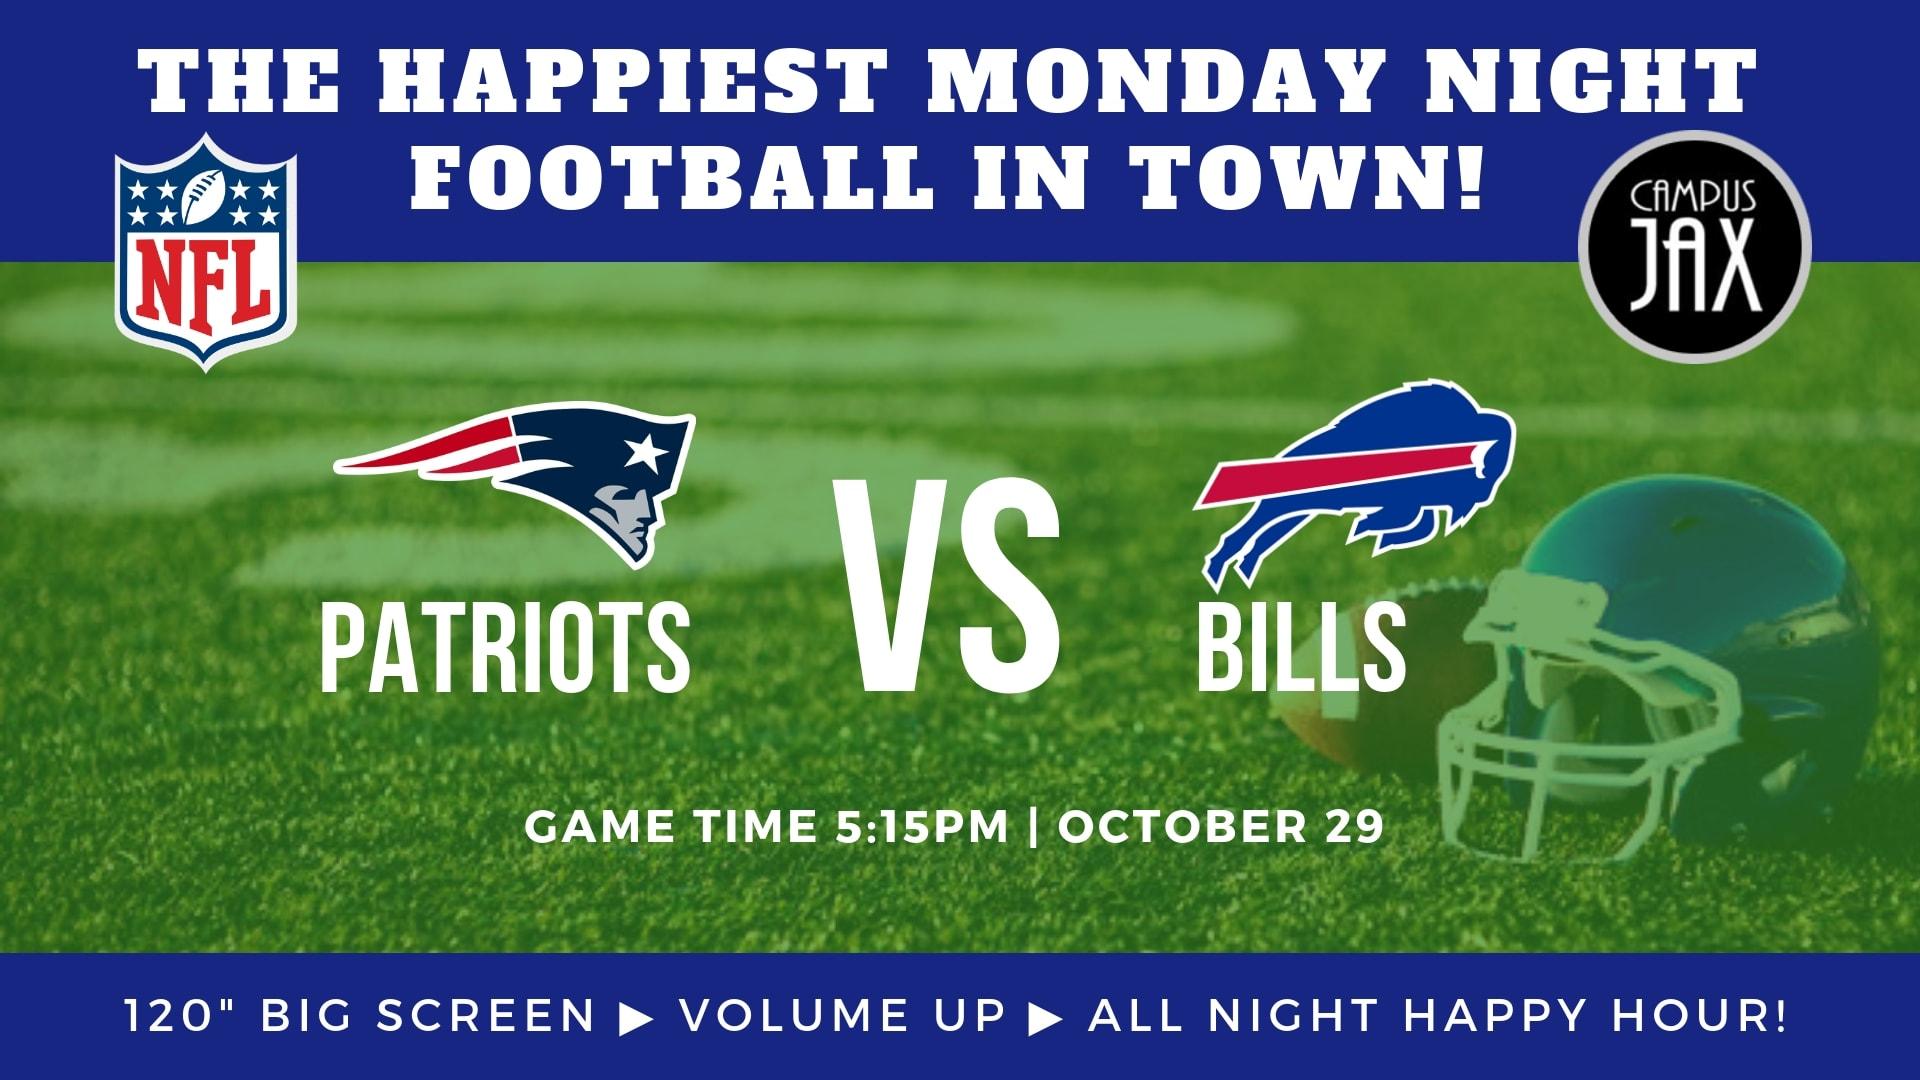 October 29 | MONDAY NIGHT FOOTBALL